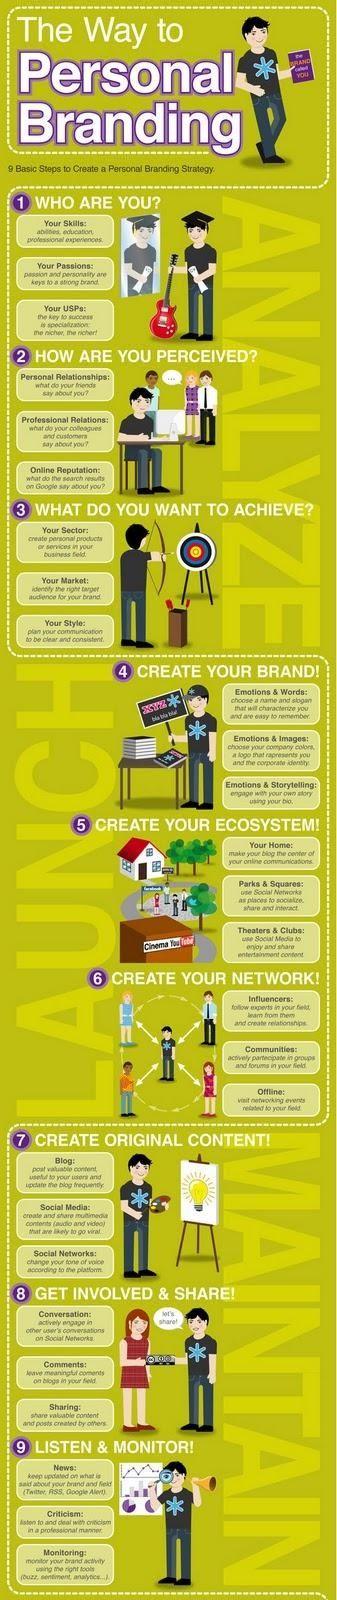 Desarrolla tu Personal branding